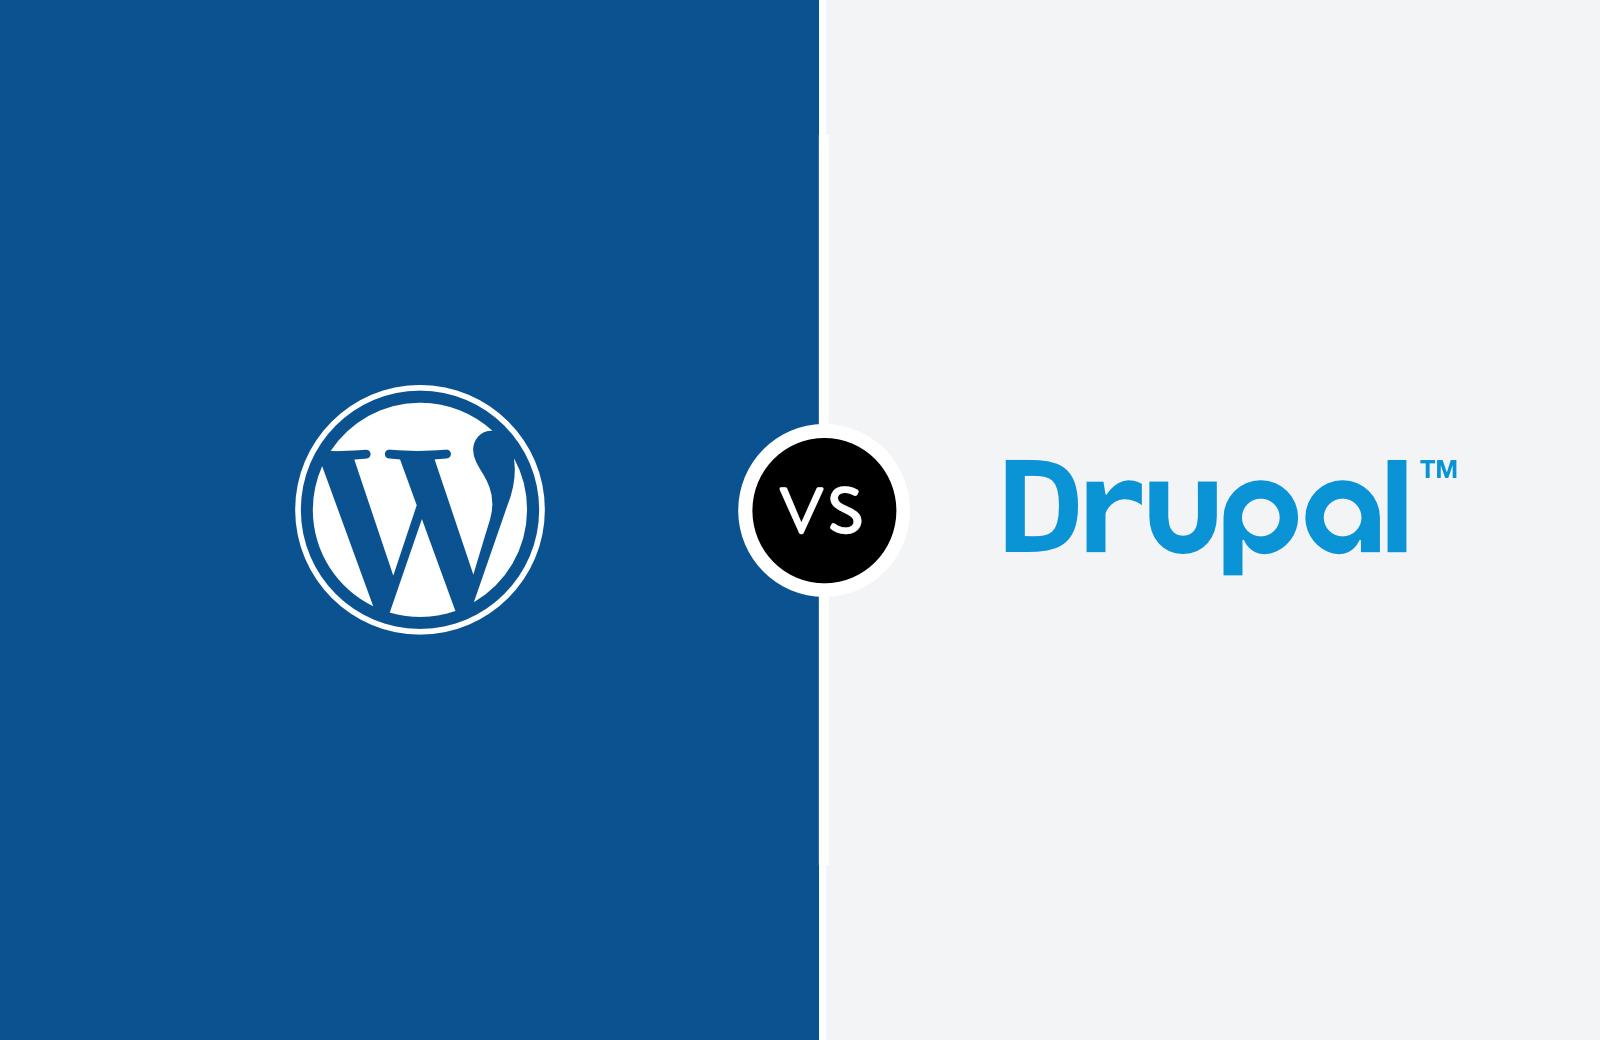 wordpress or drupal